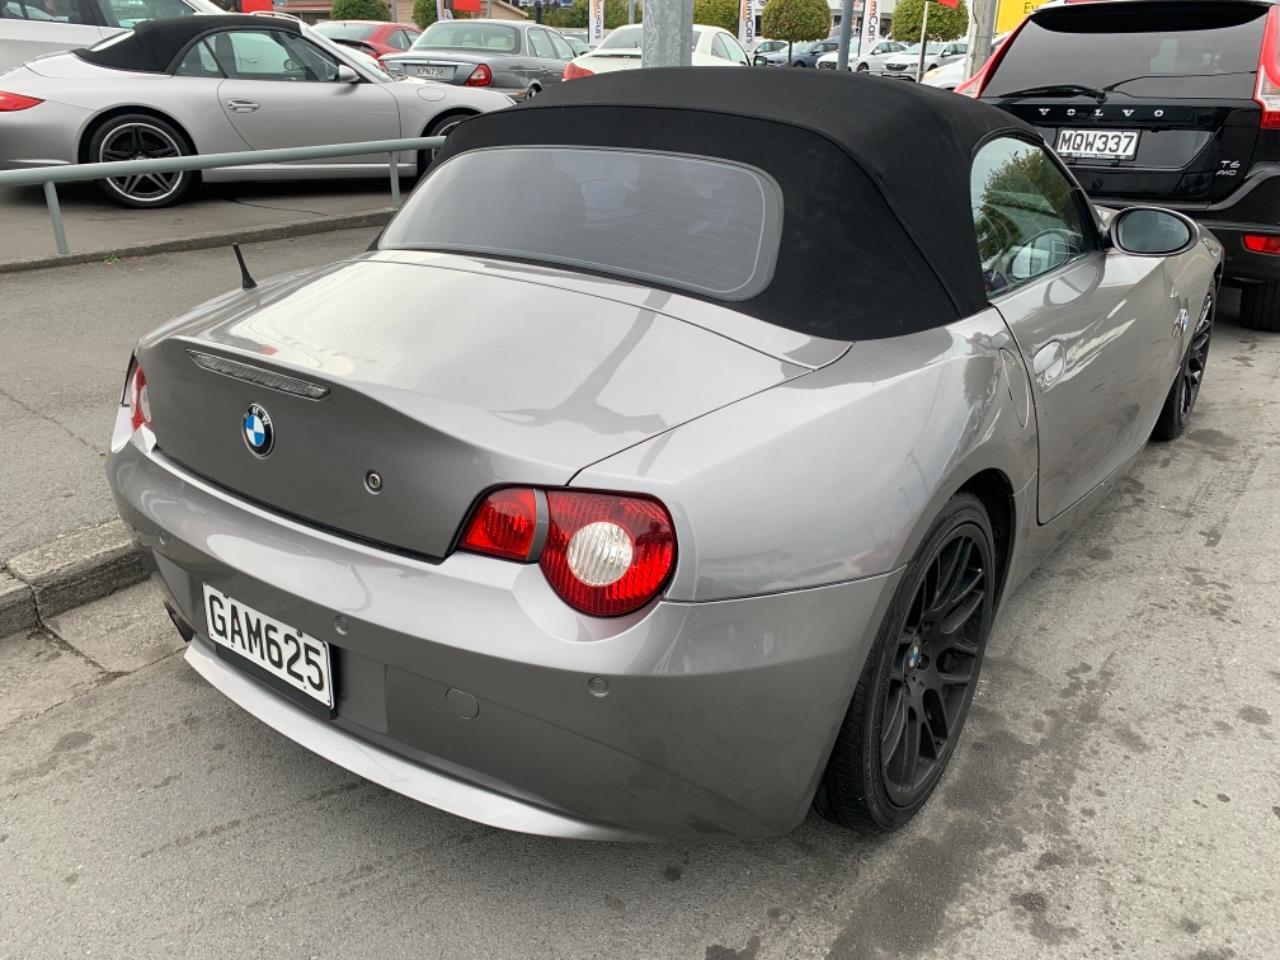 image-5, 2005 BMW Z4 at Christchurch